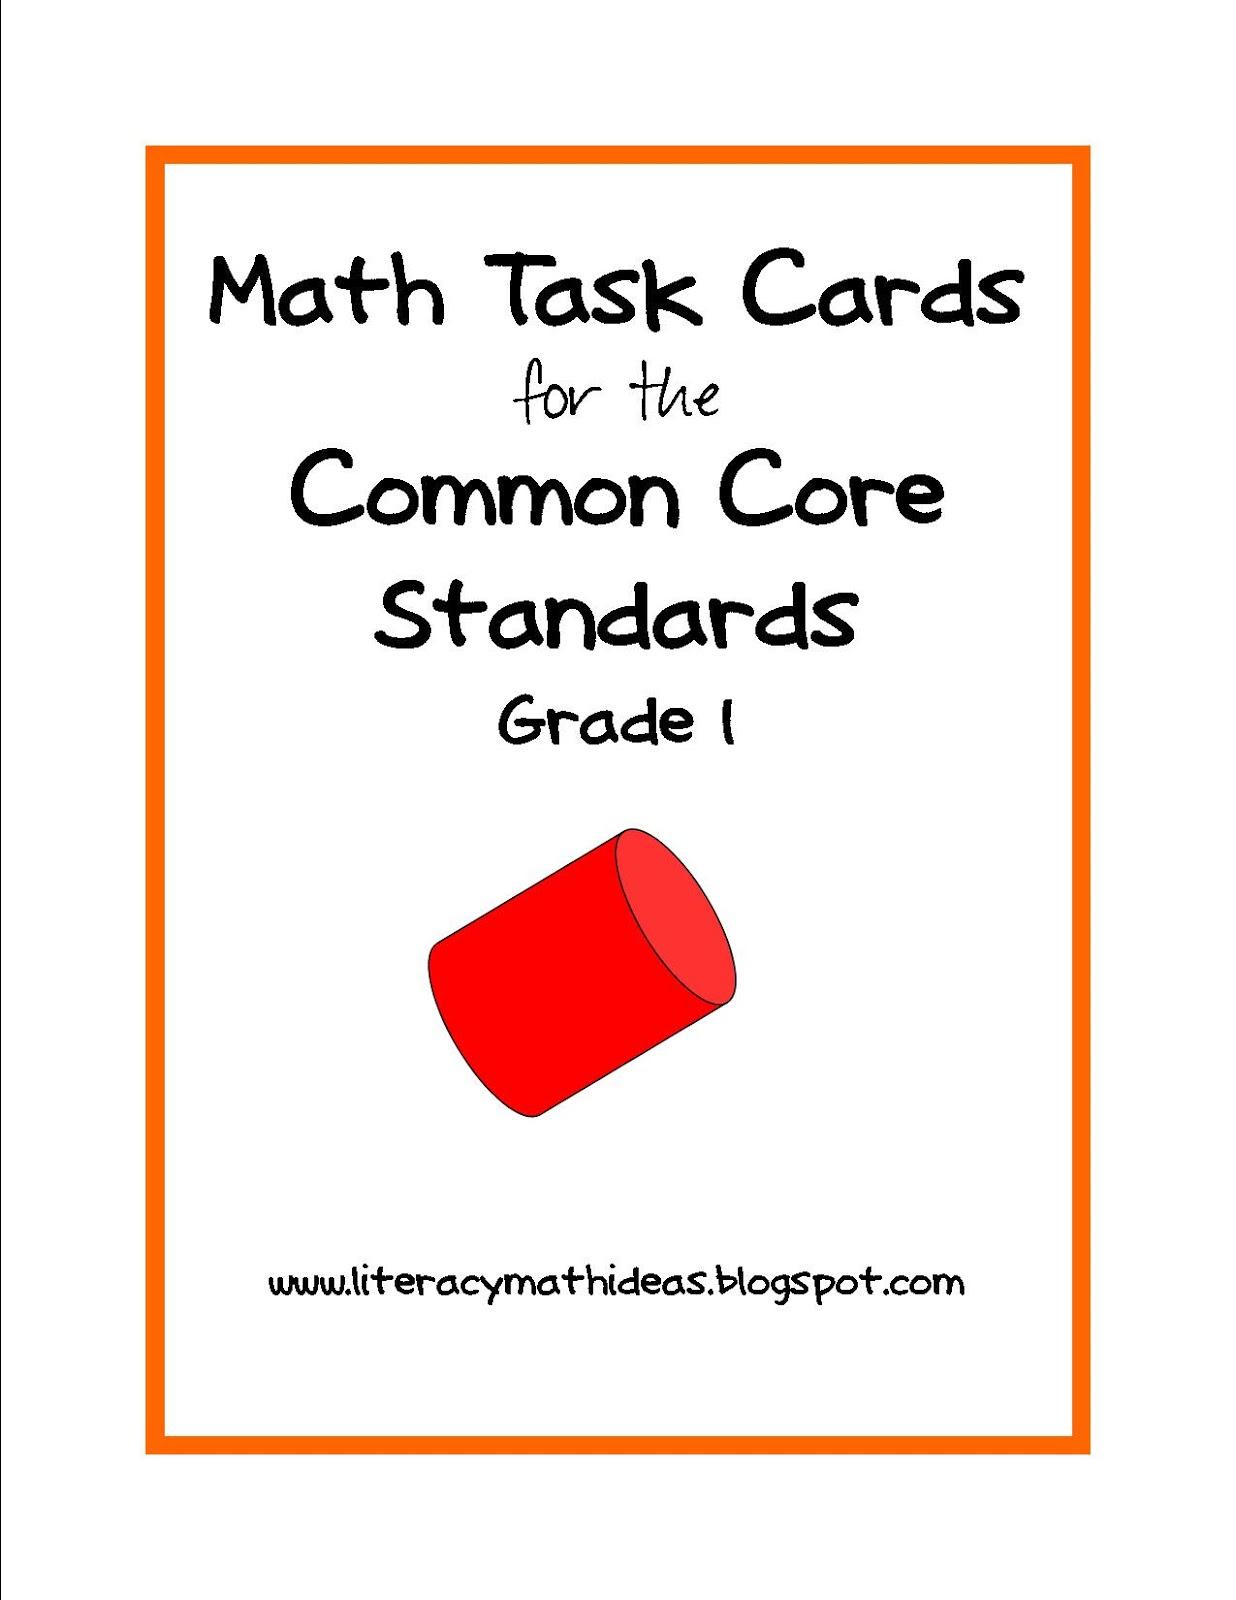 Literacy Amp Math Ideas Math Common Core Standards Task